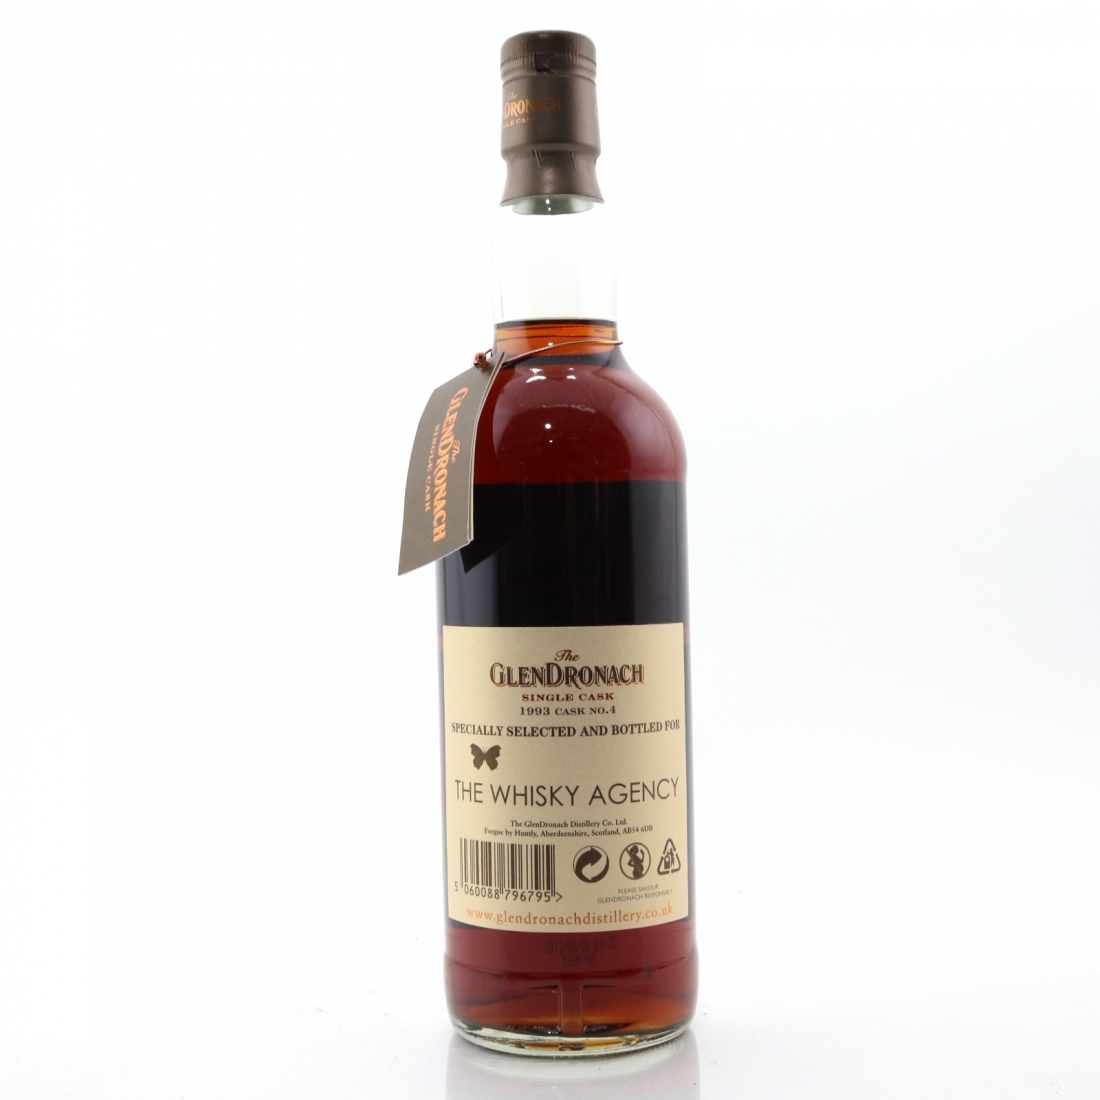 Glendronach 1993 Single Cask 20 Year Old #4 / The Whisky Agency